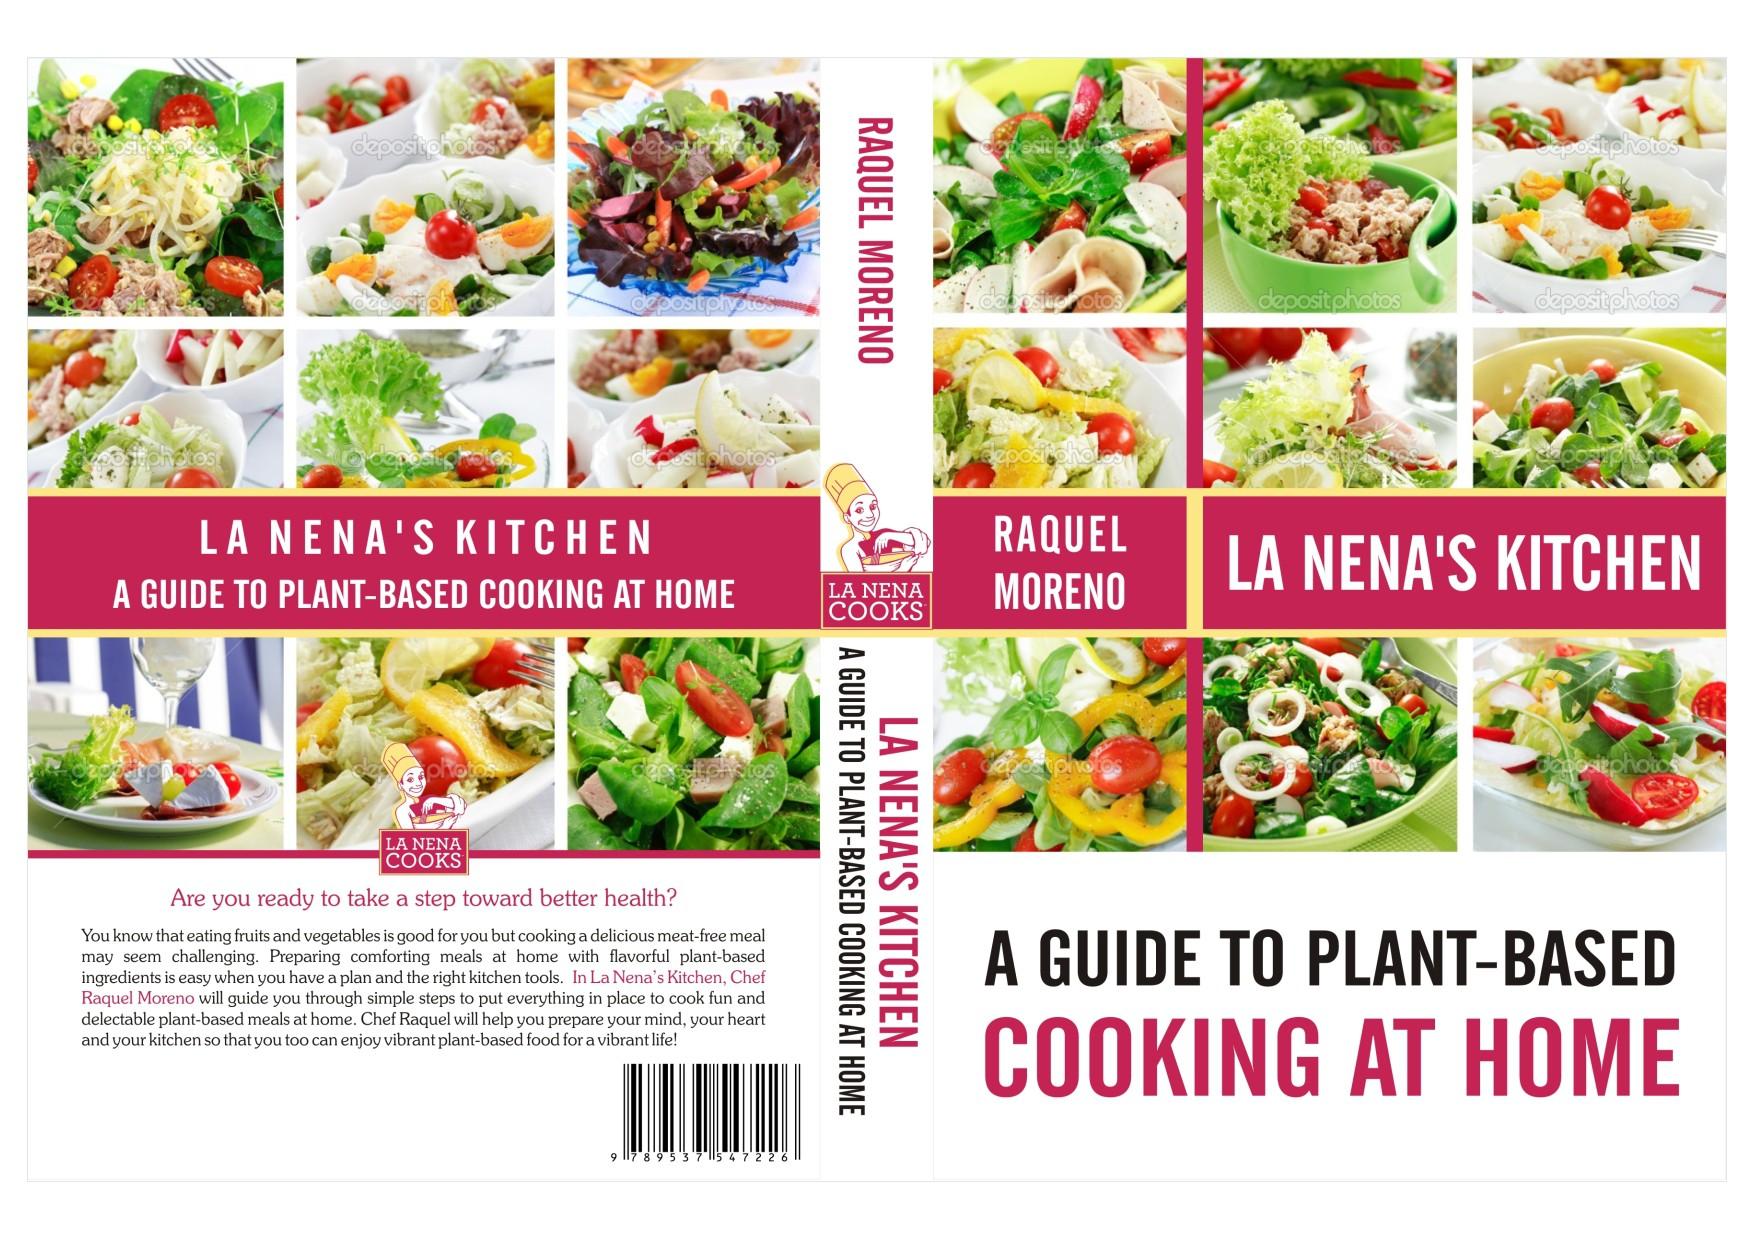 La Nena Cooks needs a new book cover